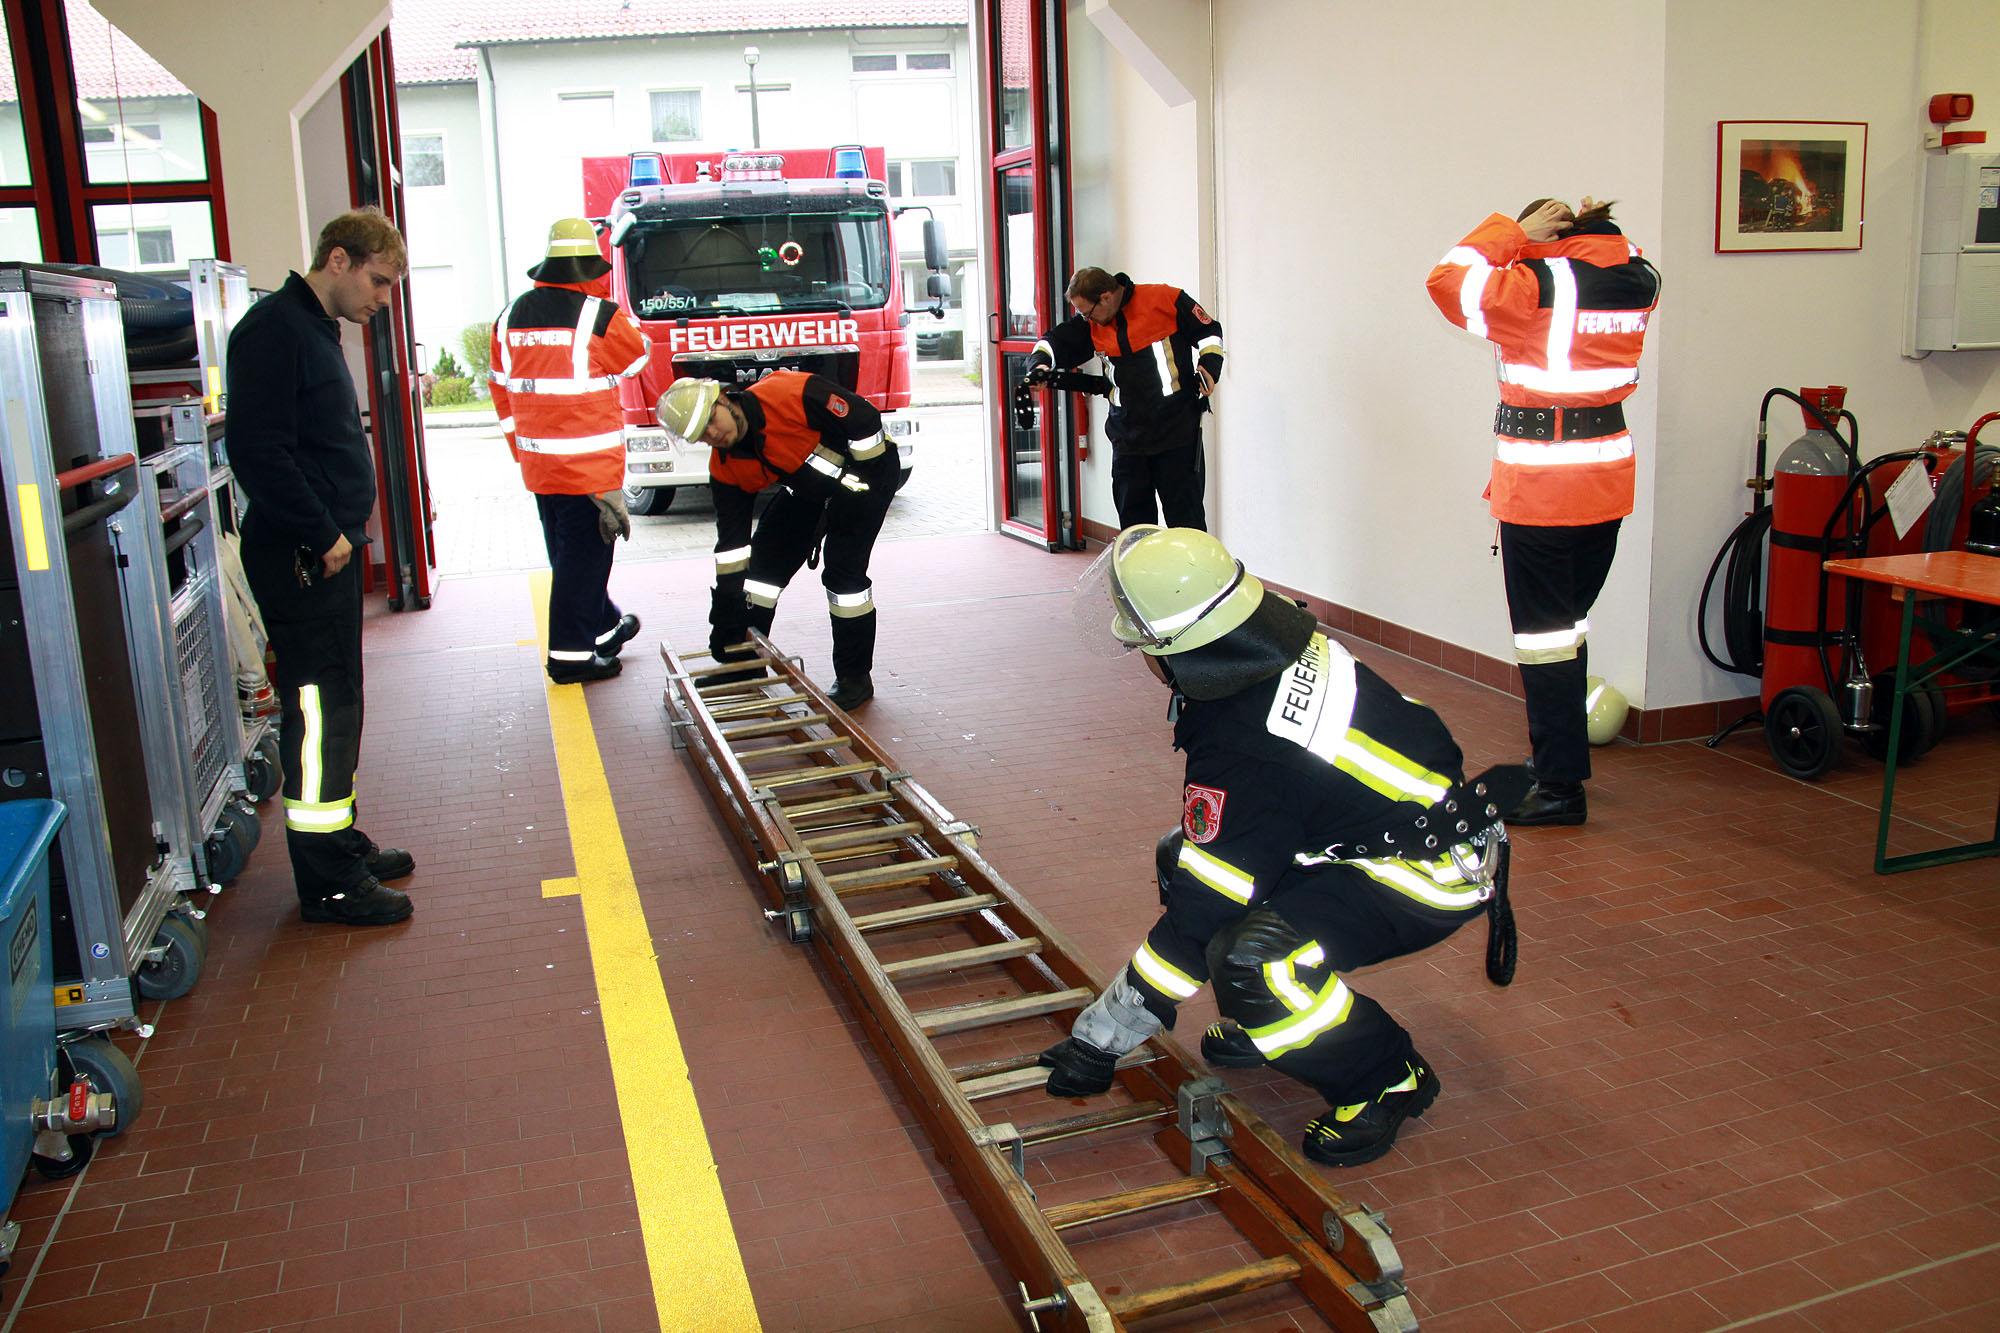 2016_04_16_MTA-Sbr-Leitern_05-2000p